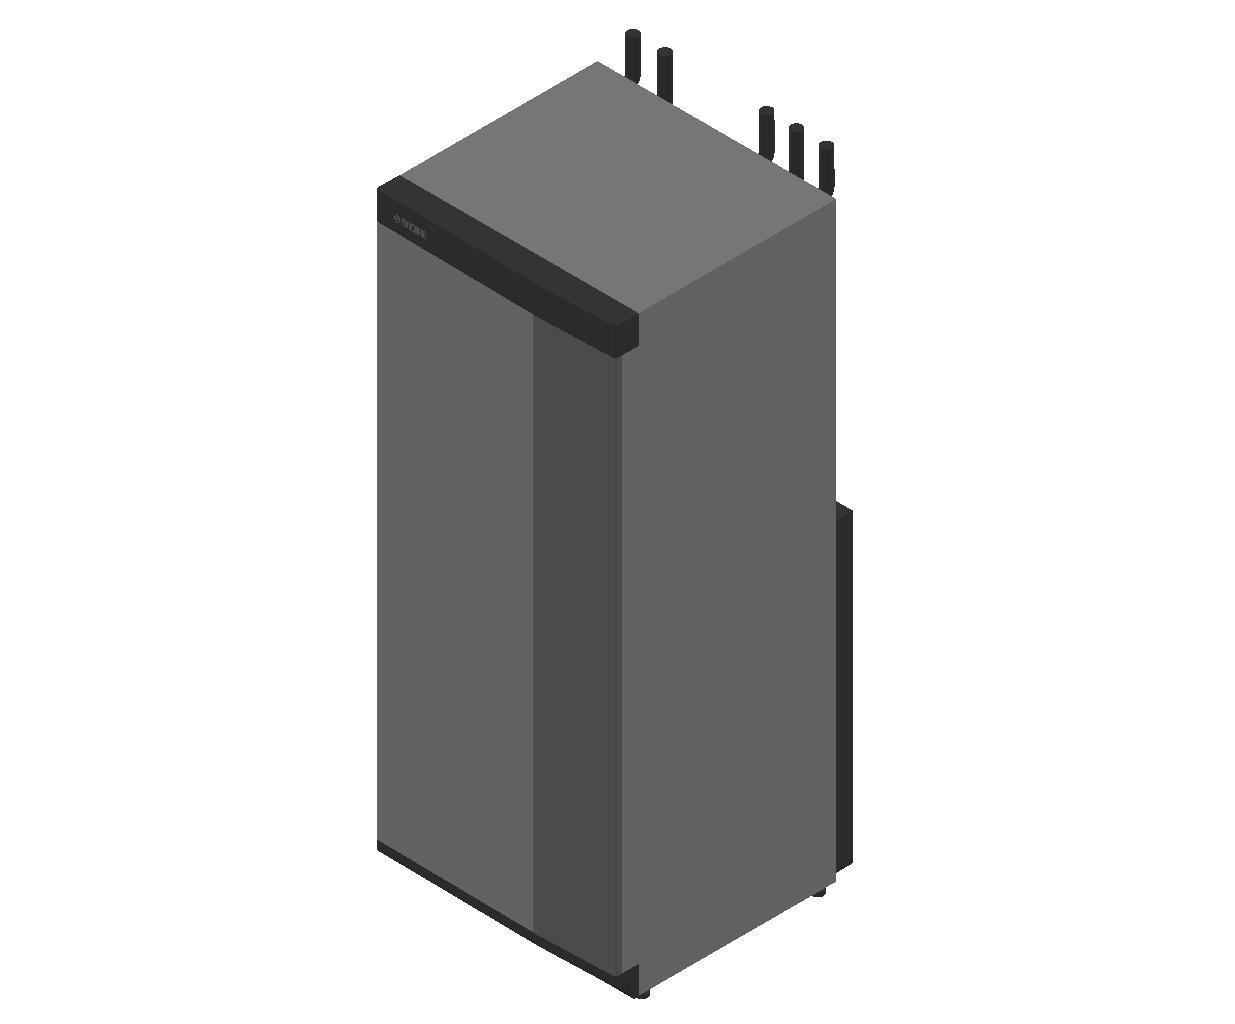 HC_Heat Pump_MEPcontent_NIBE_S1155-12 3x400V_INT-EN.dwg